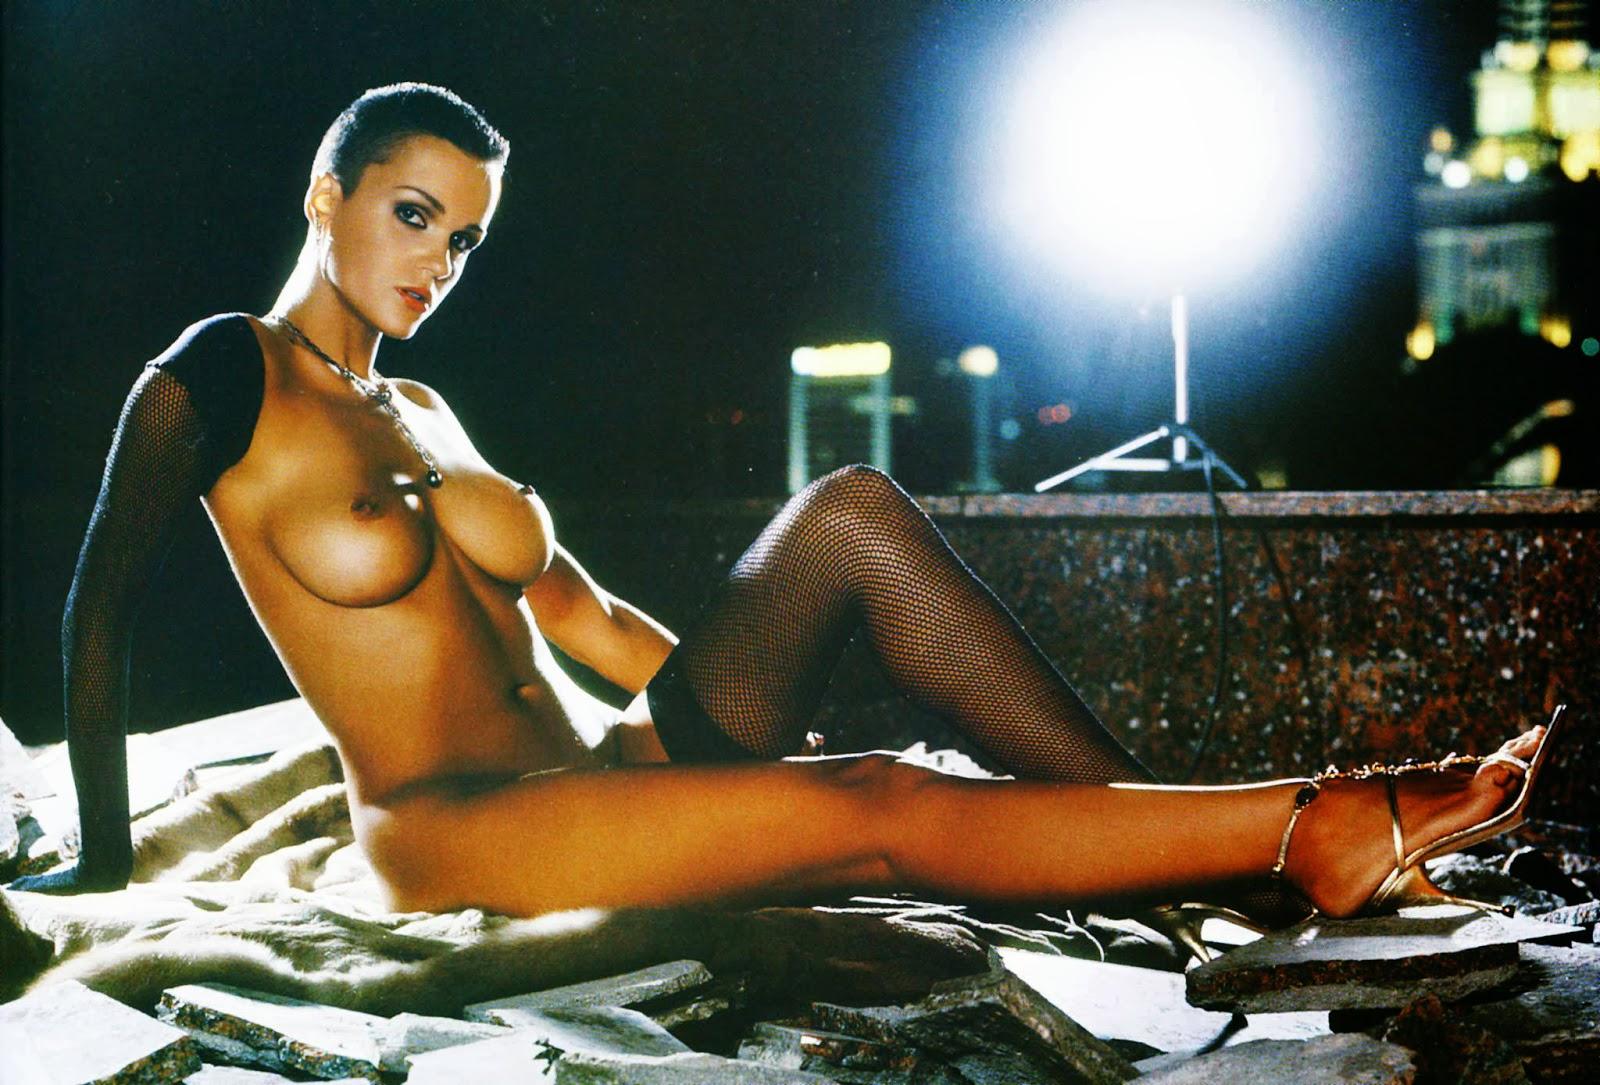 molodezh-russkie-znamenitie-aktrisi-v-erotike-ustroili